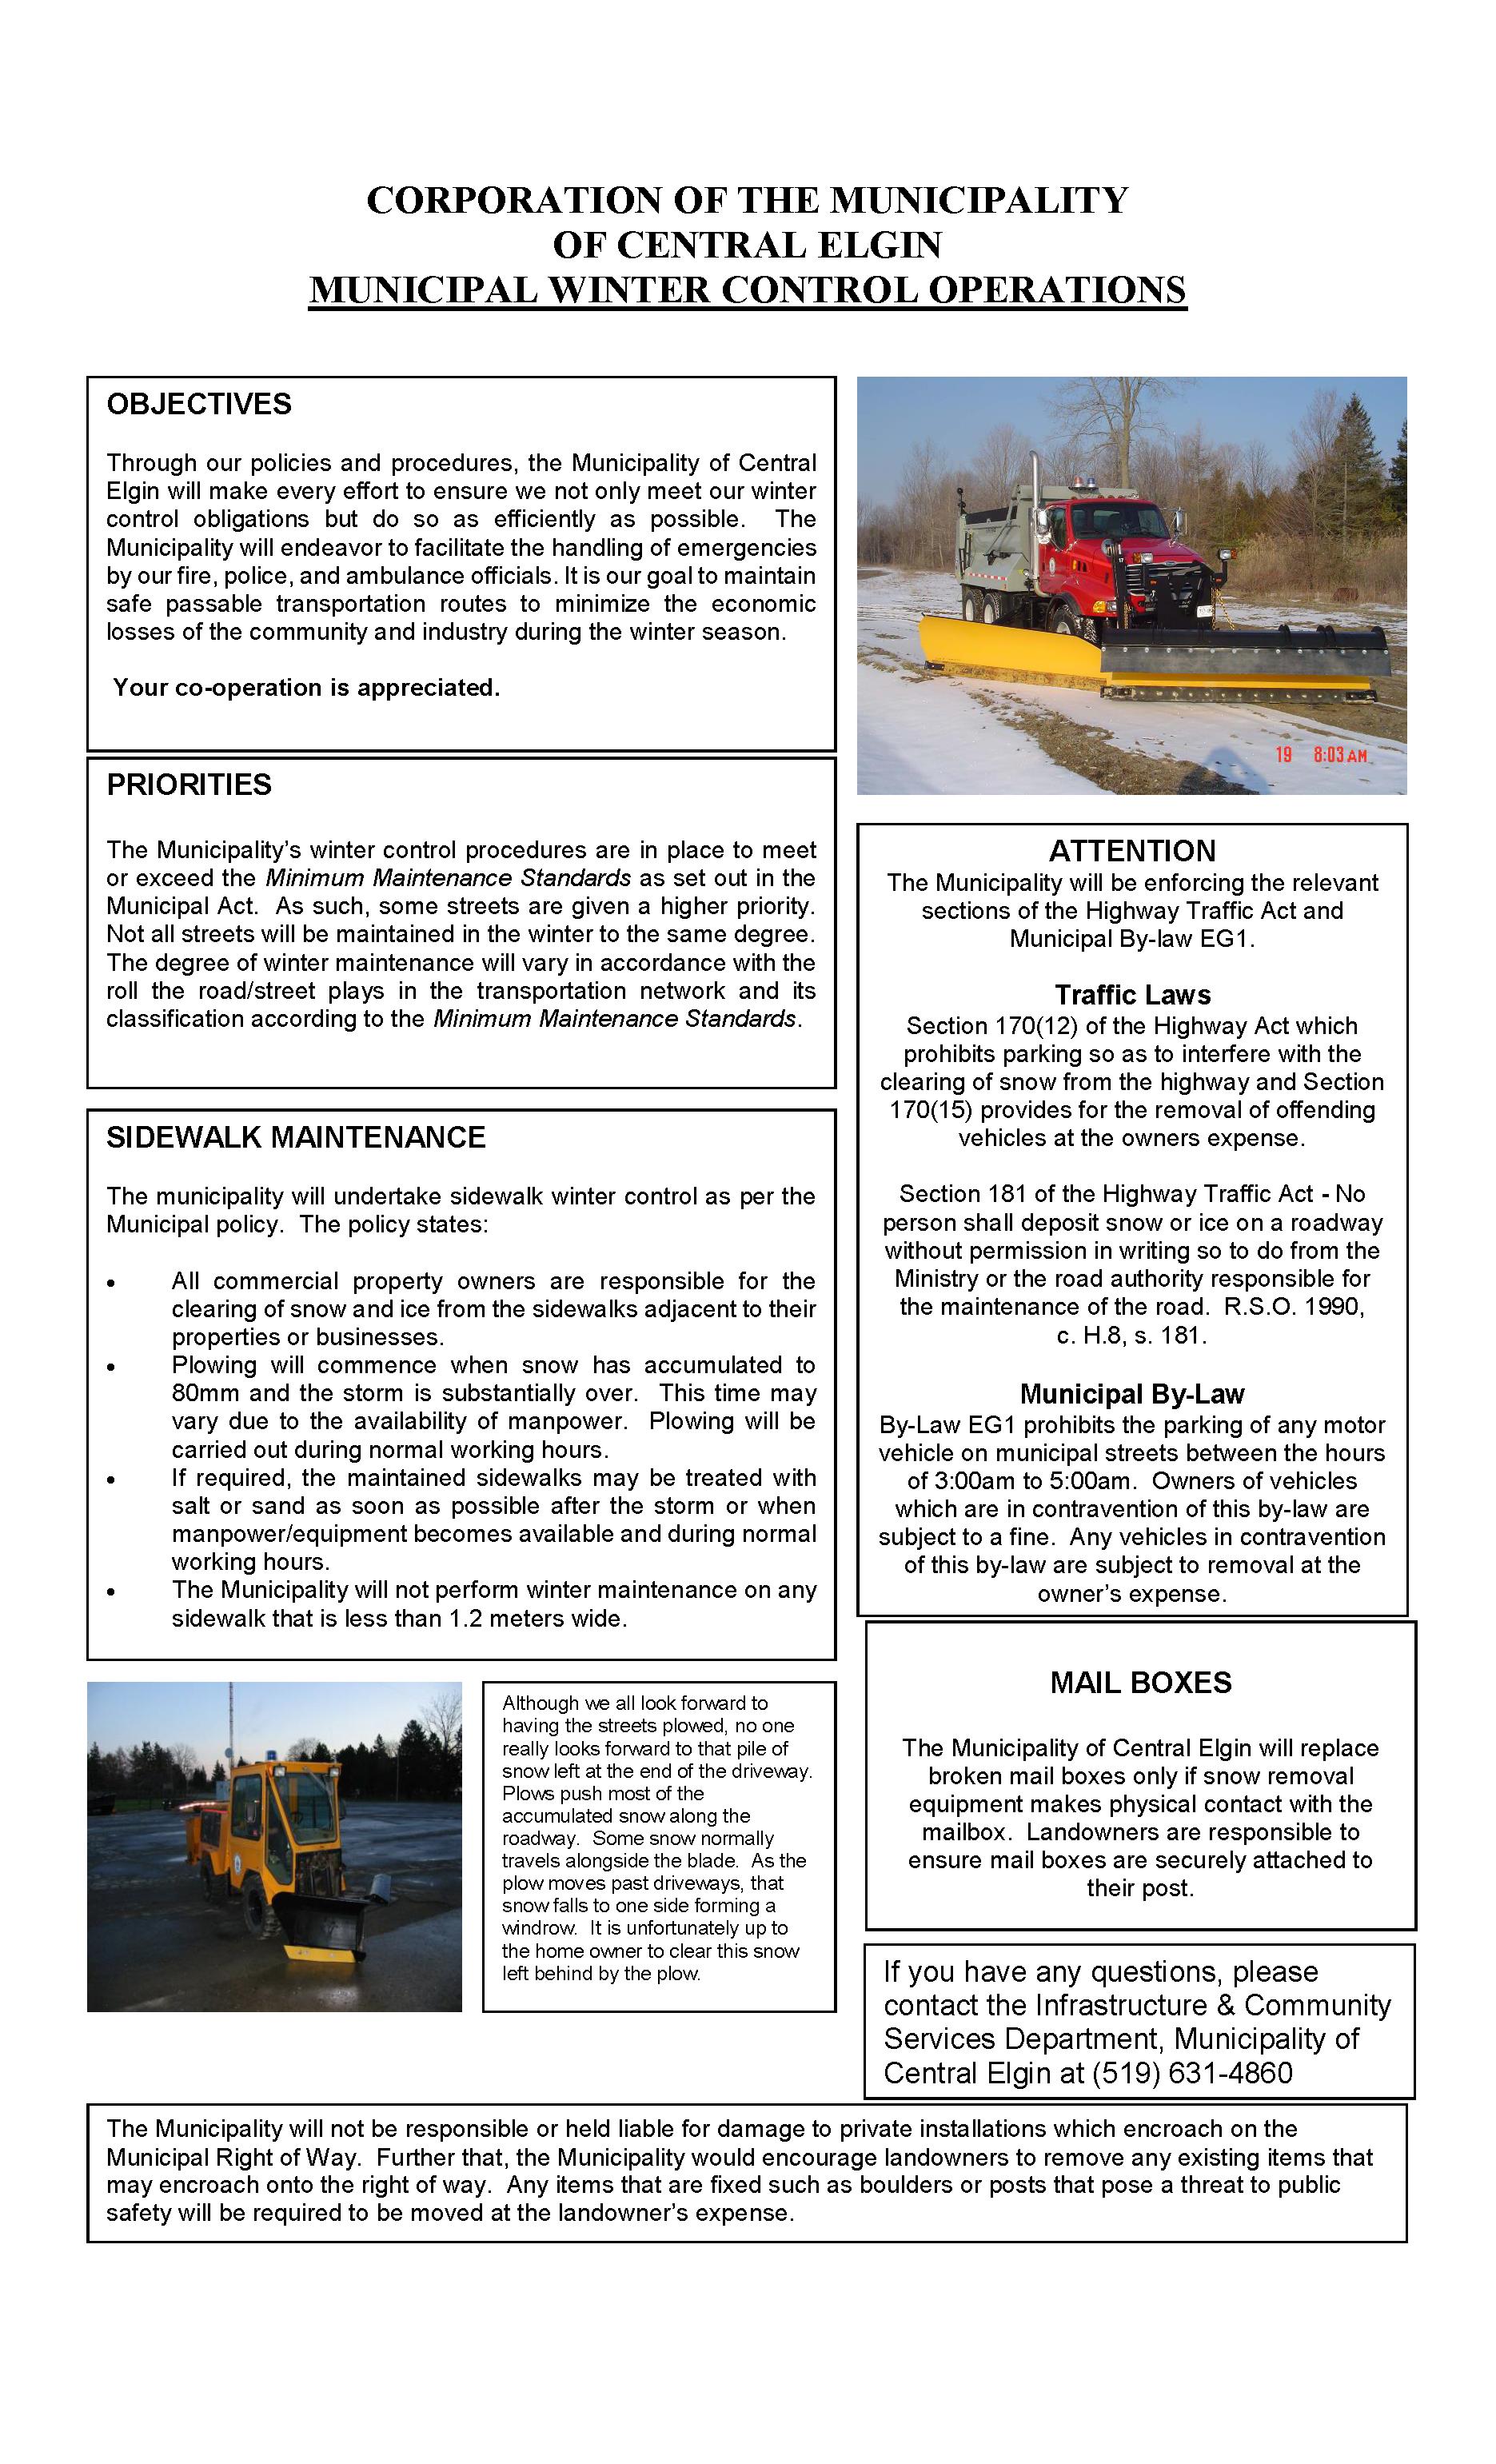 Winter Control Advertisement 2020